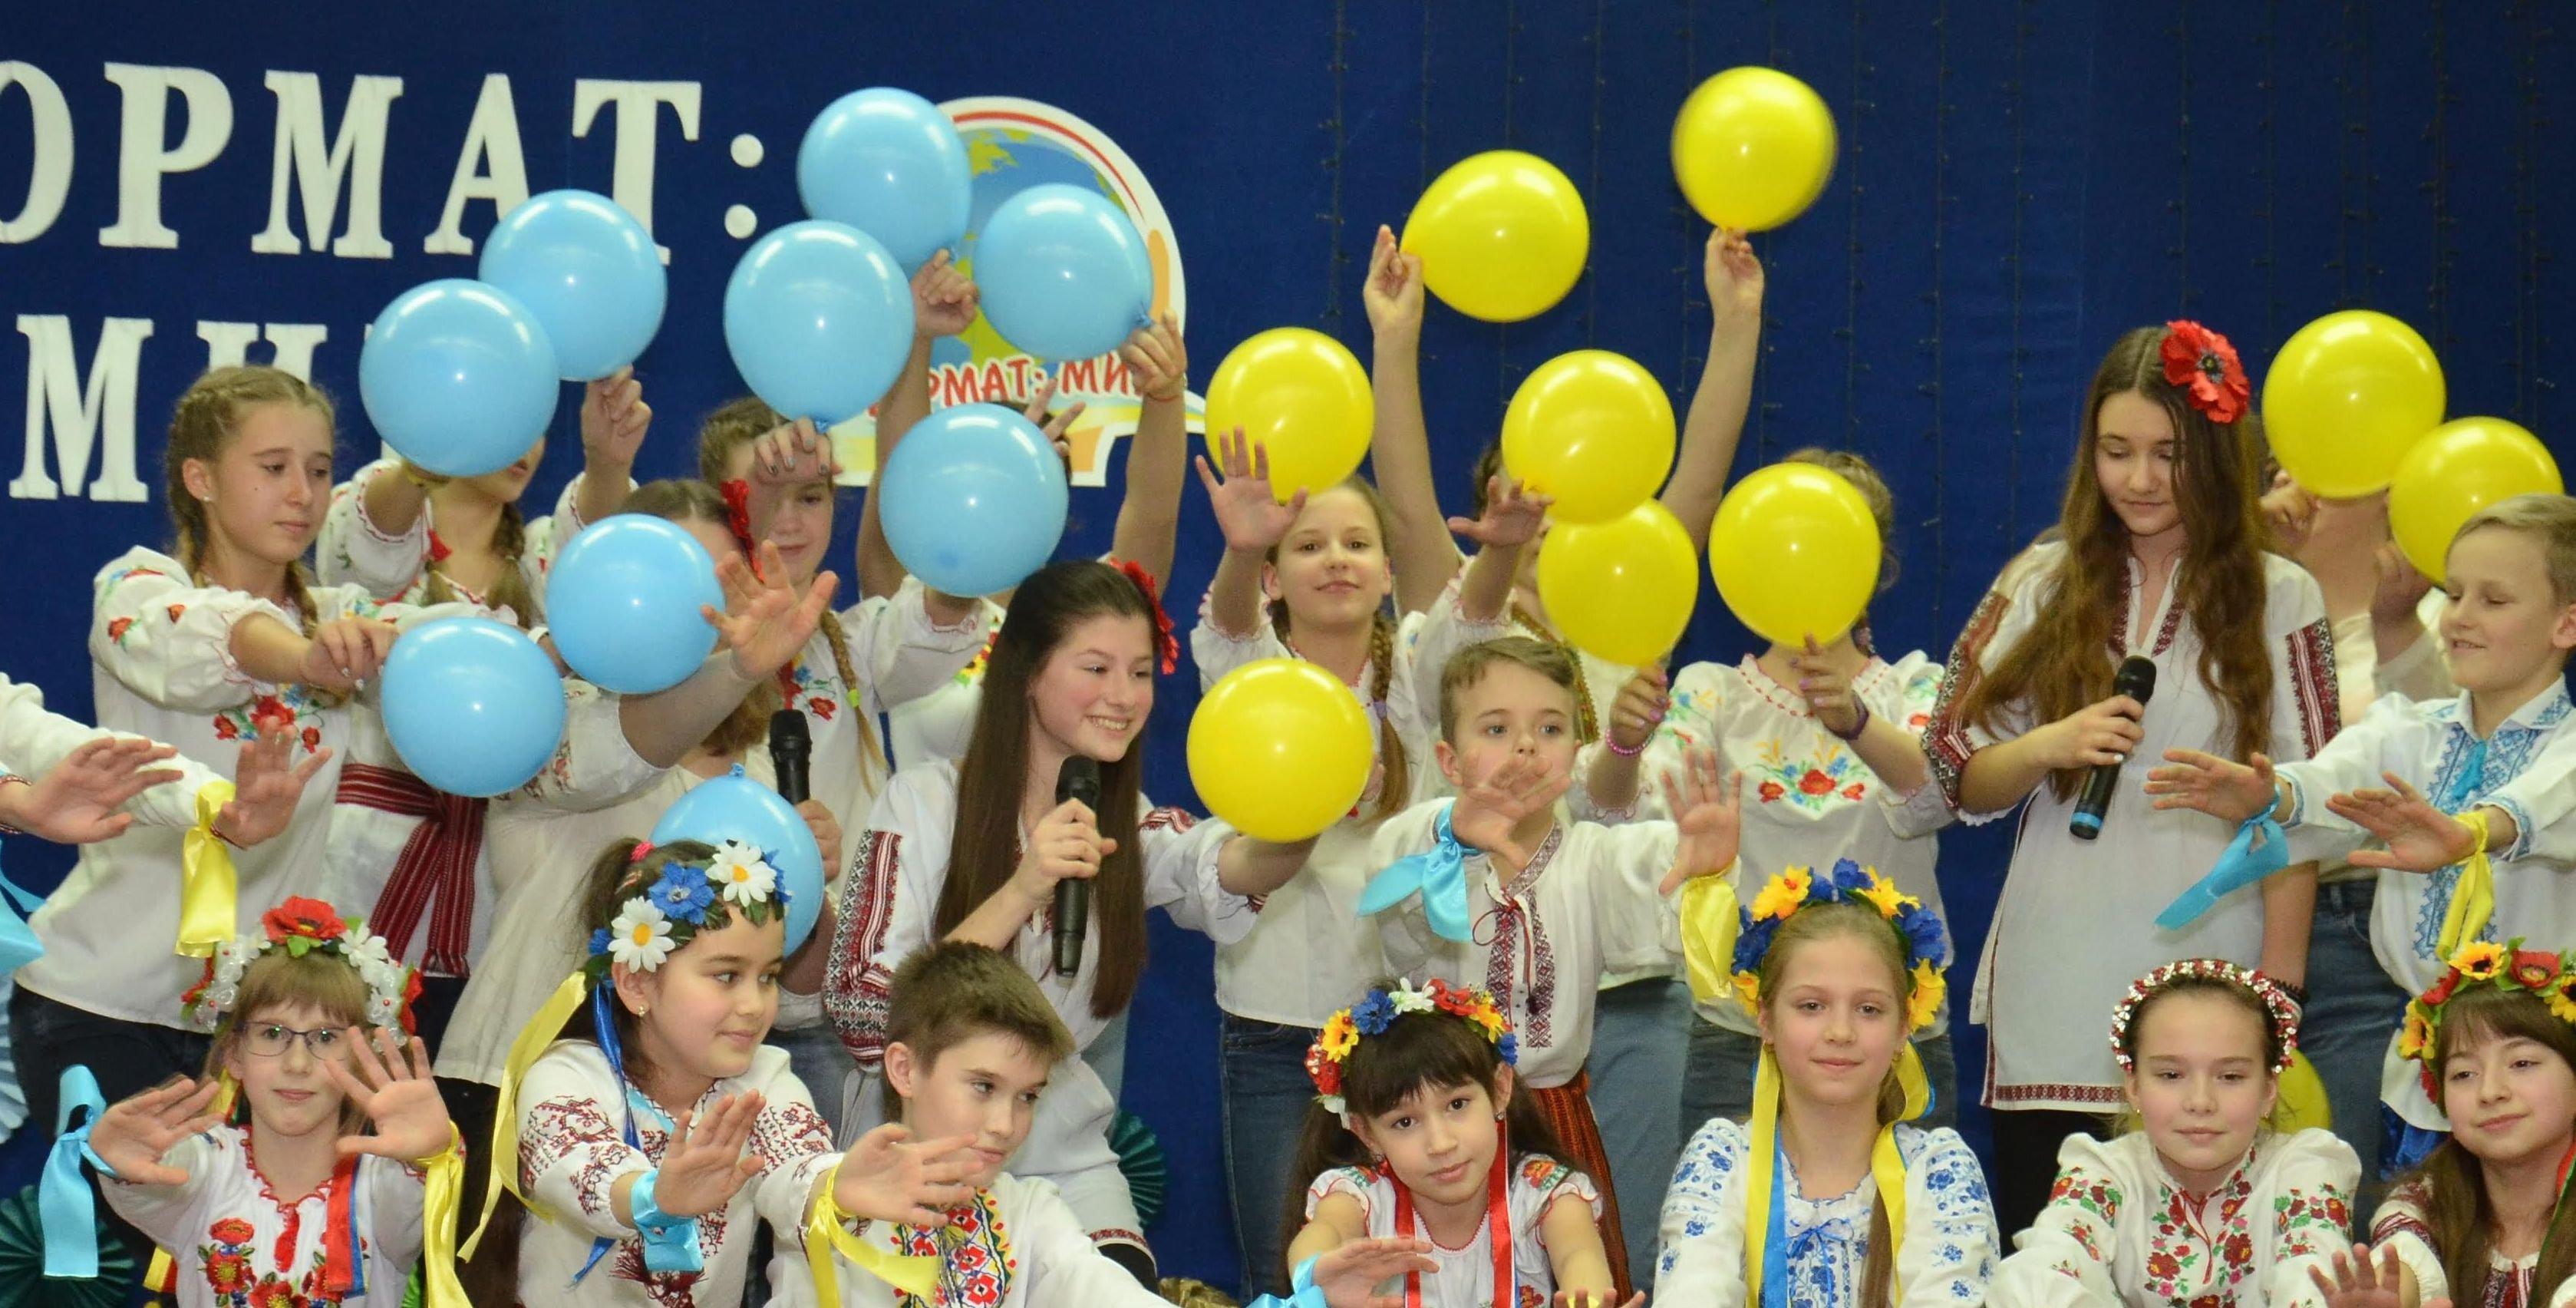 Дитячий миротворчий фестиваль «Формат: МИР»